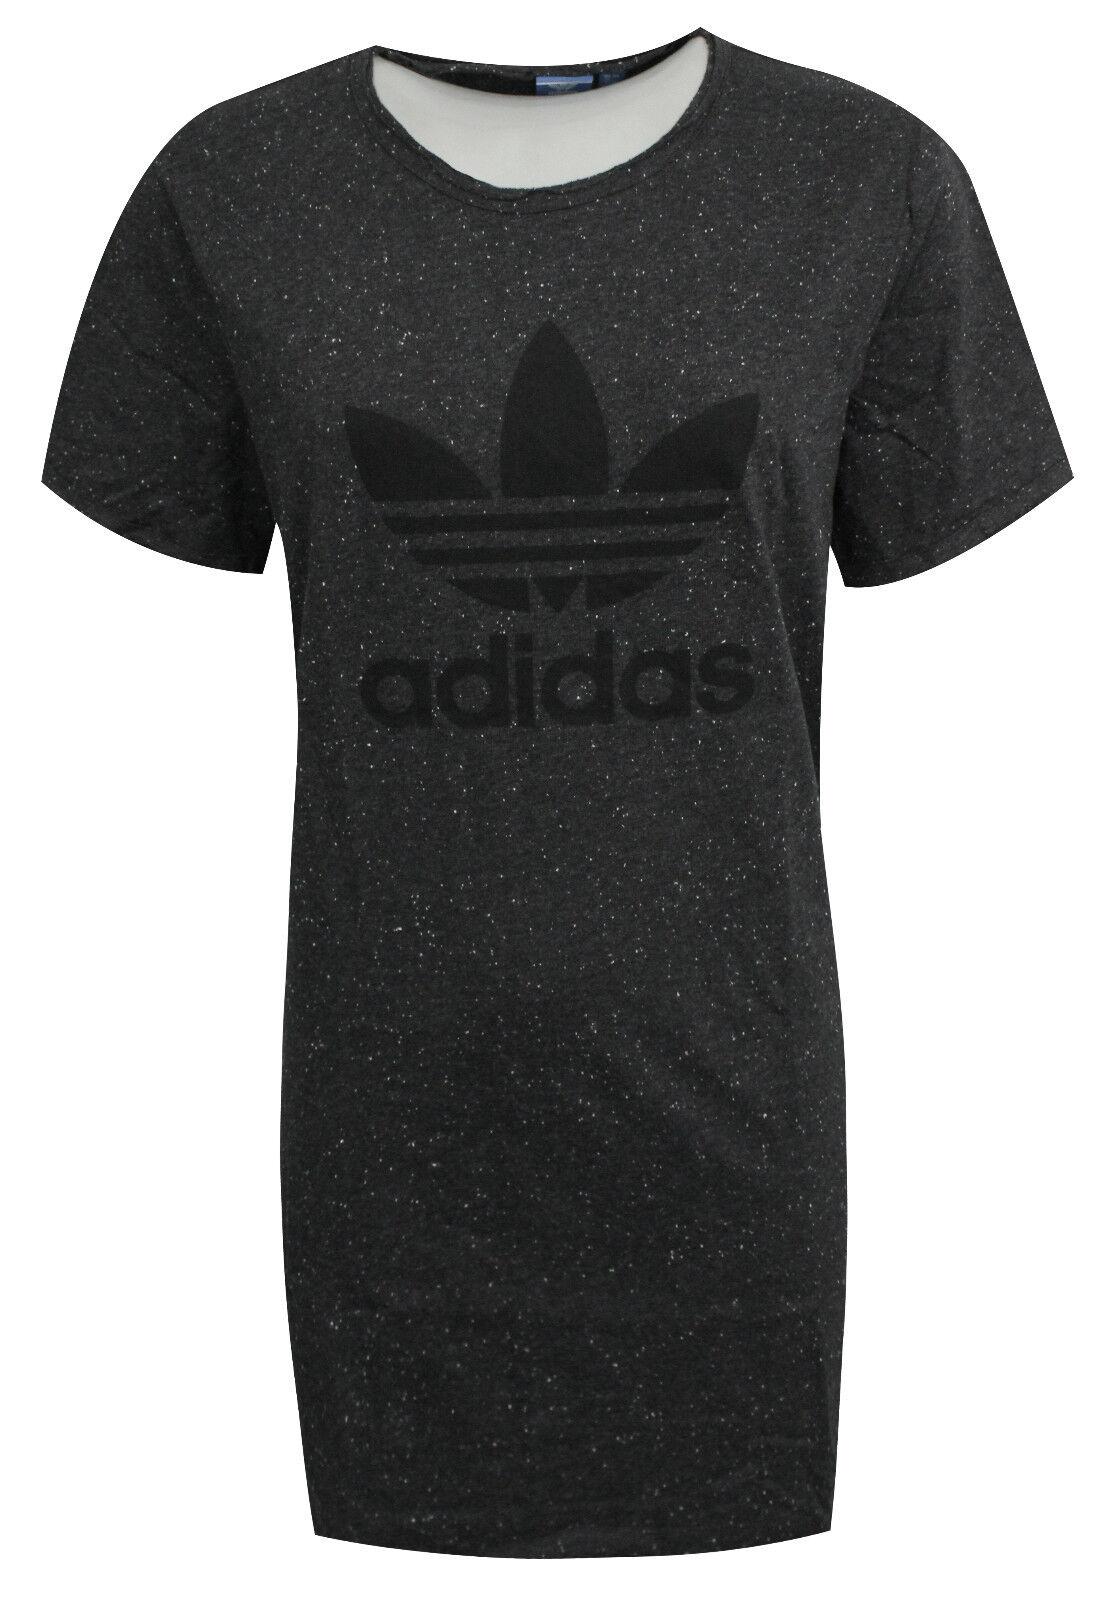 "Adidas ΓυναικΡίο Ο†ΟŒΟΞ΅ΞΌΞ± ΞΌΞ΅ τριαντάφυλλο T-shirt ΞΌΞ΅ ΞΊΞΏΞ½Ο""ΟŒ ΞΌΞ±Ξ½Ξ―ΞΊΞΉ T Shirt Γκρι BR4604 RW63"